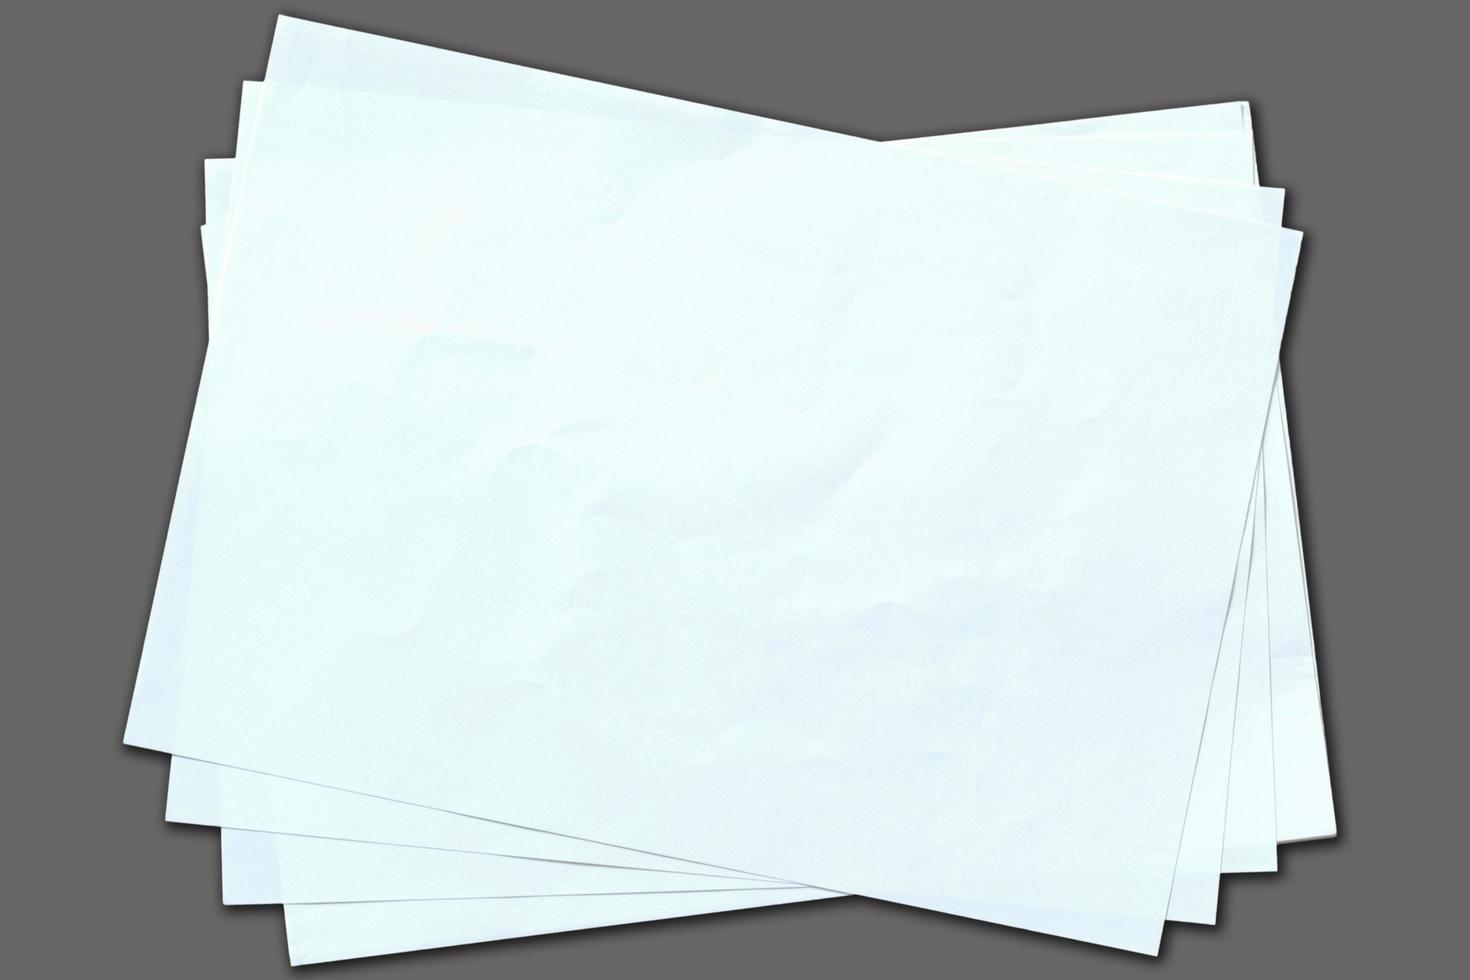 isoliertes leeres weißes Papier foto